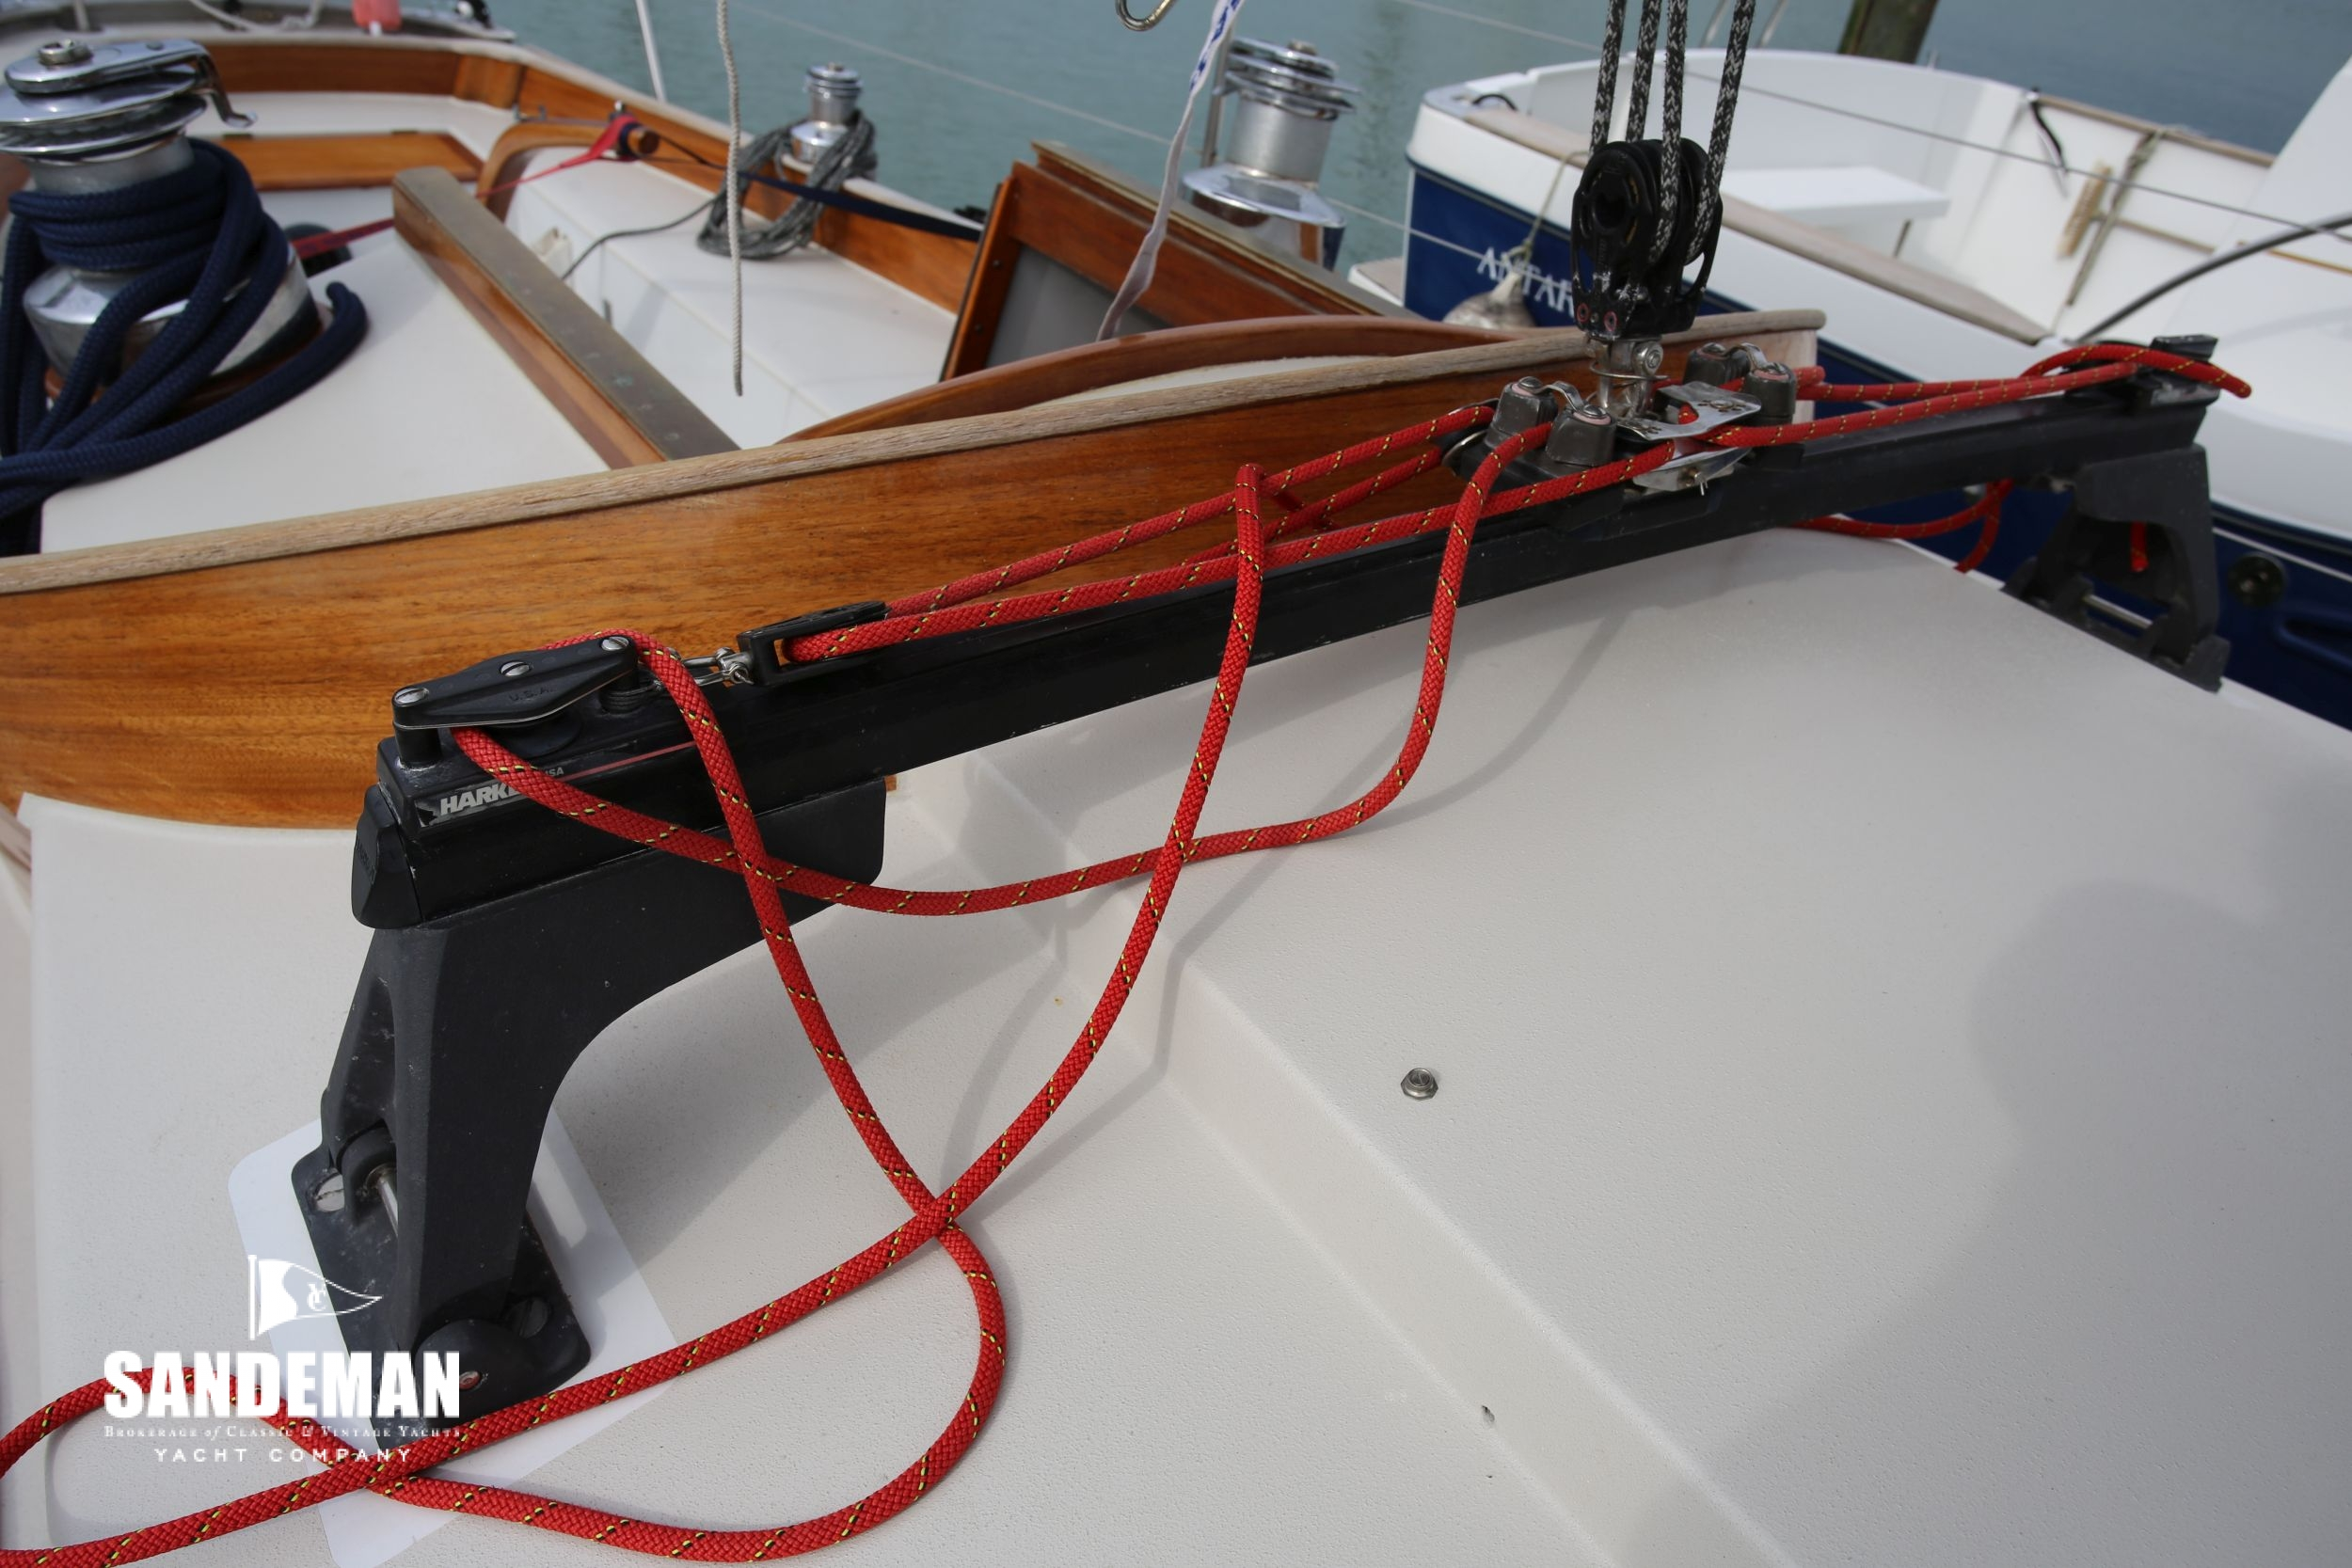 Sparkman Stephens 37 Ft Sloop 1966 Sandeman Yacht Company Adverc Wiring Diagram View Gallery